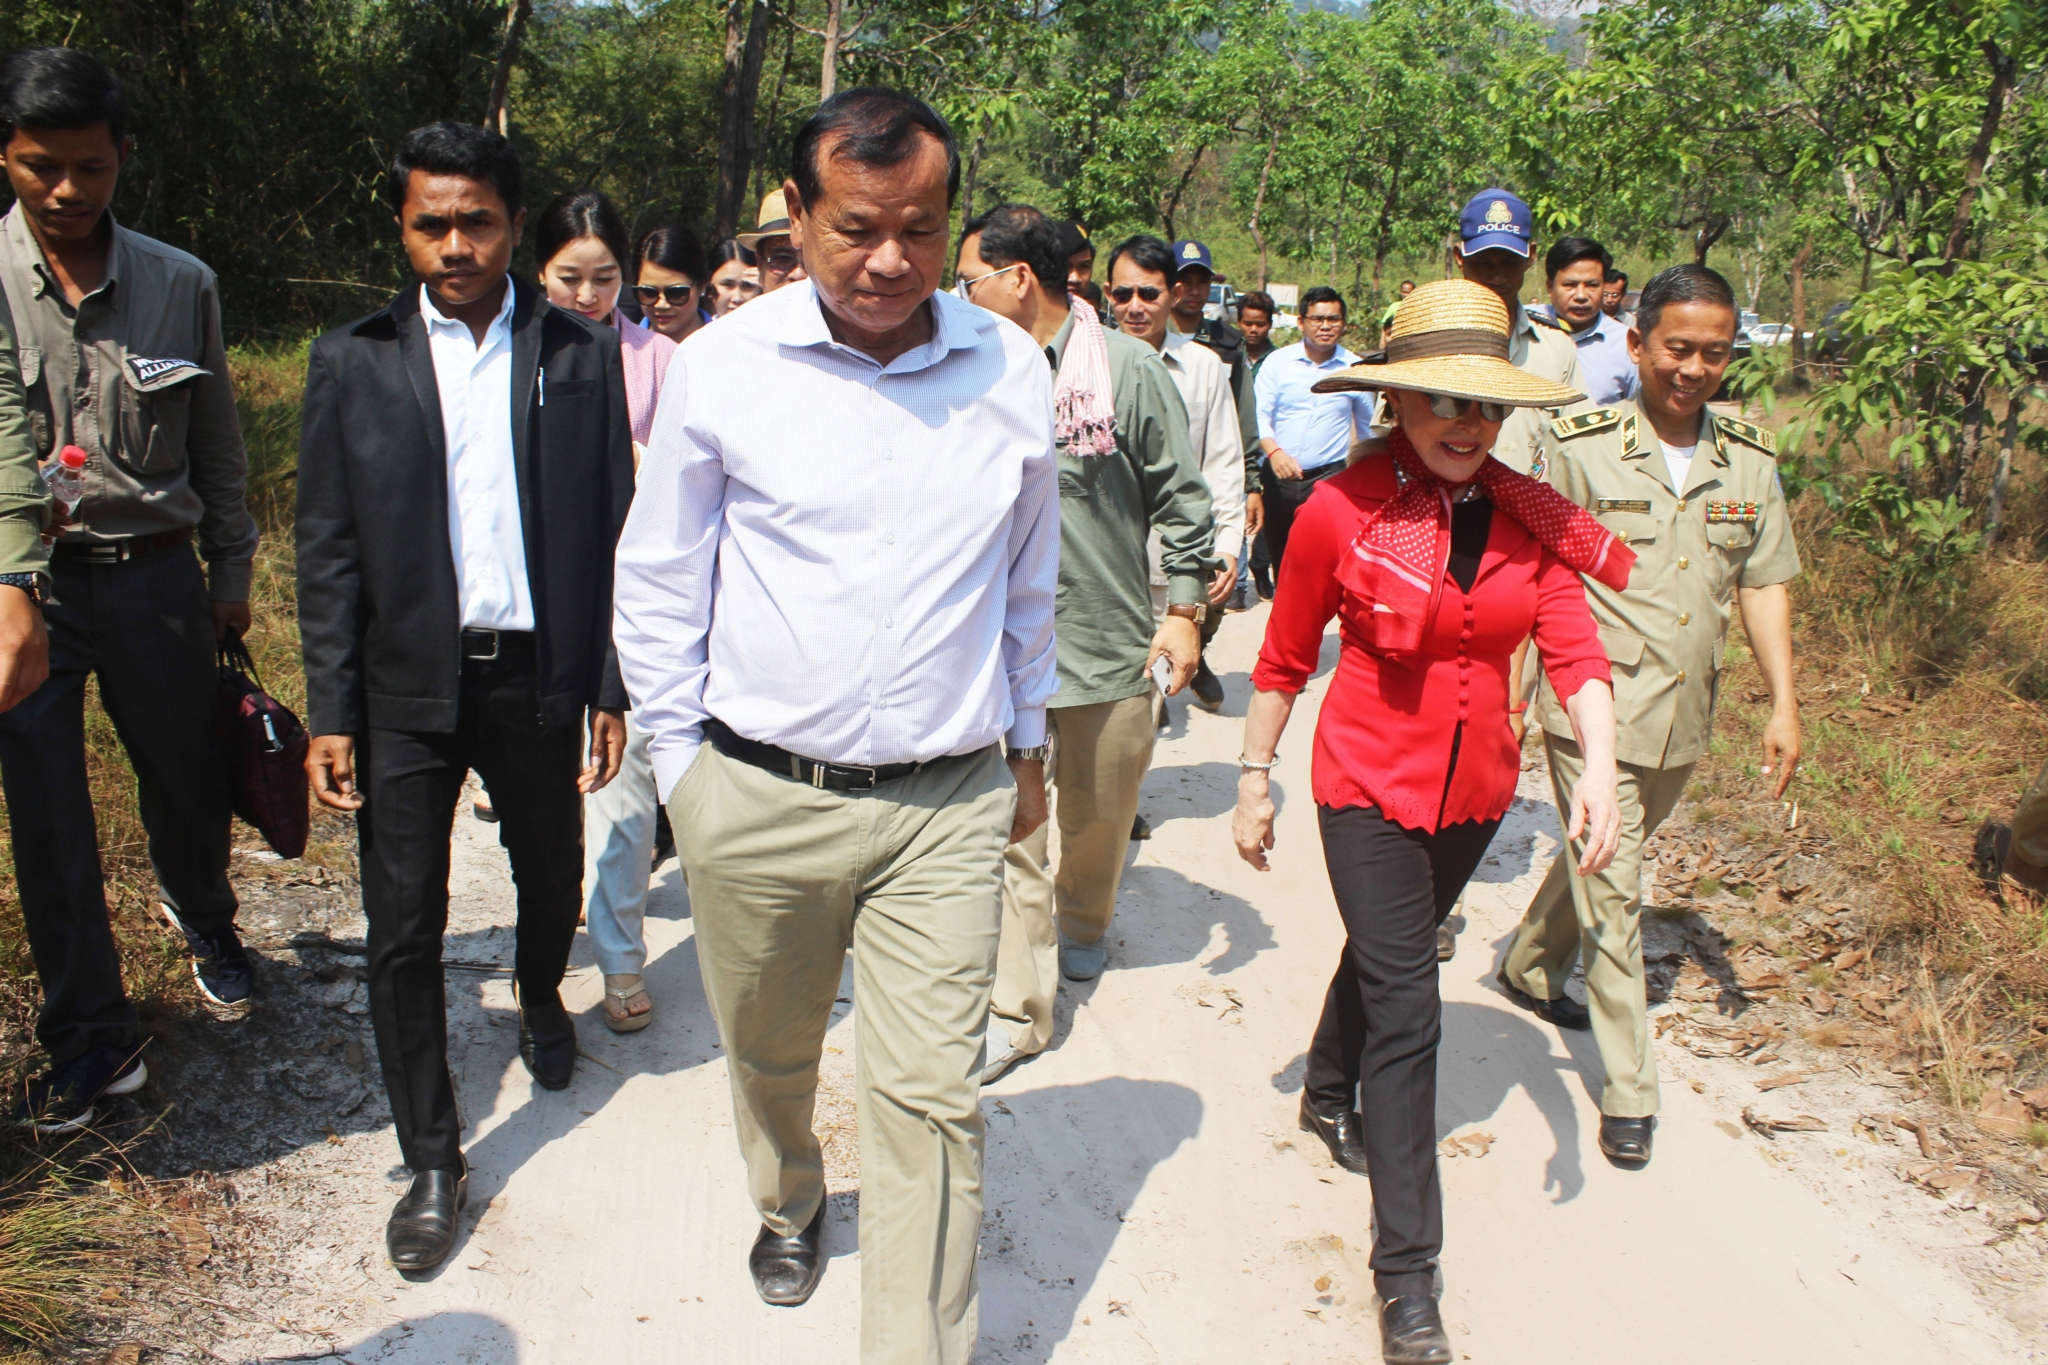 H.E. Dr. Thong Khon, Minister of Tourism visits Stung Areng community based eco-tourism (CBET)